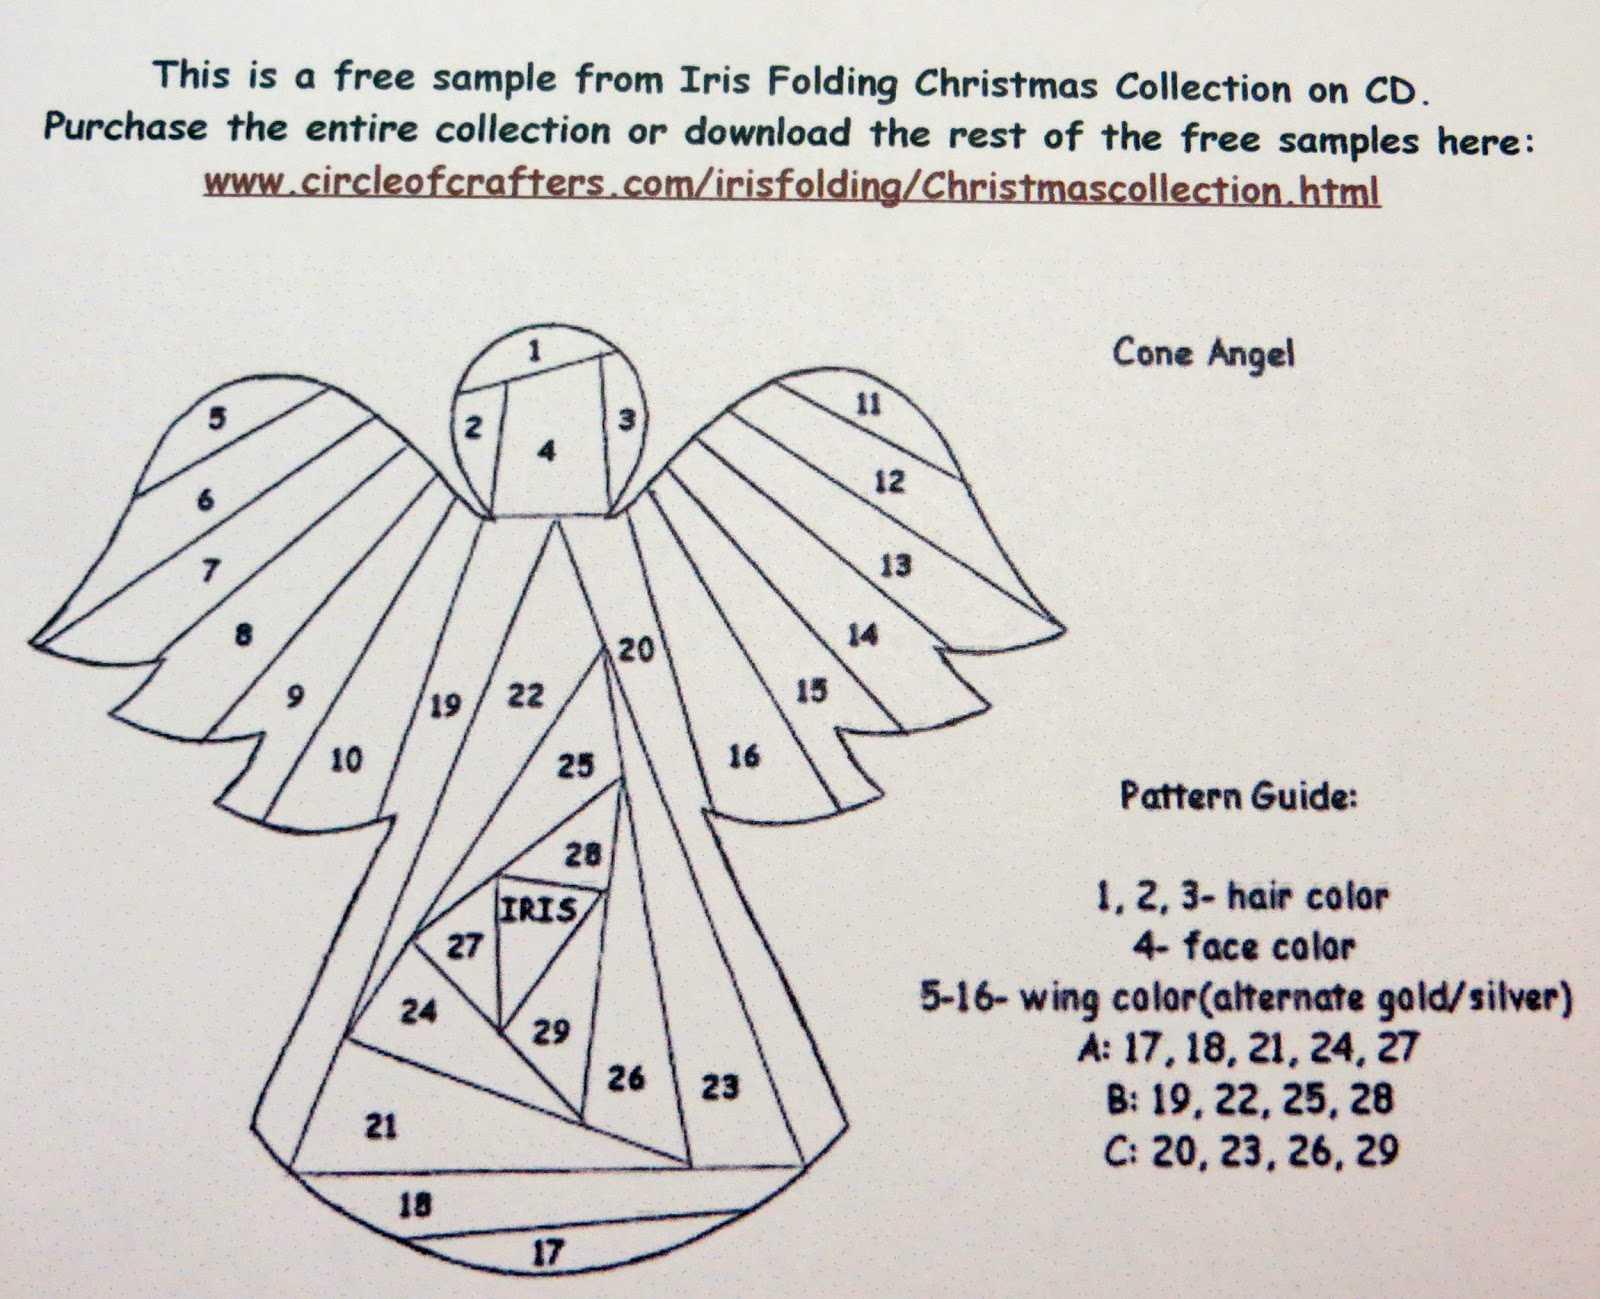 54003 Free Iris Folding Templates | Wiring Resources Throughout Iris Folding Christmas Cards Templates